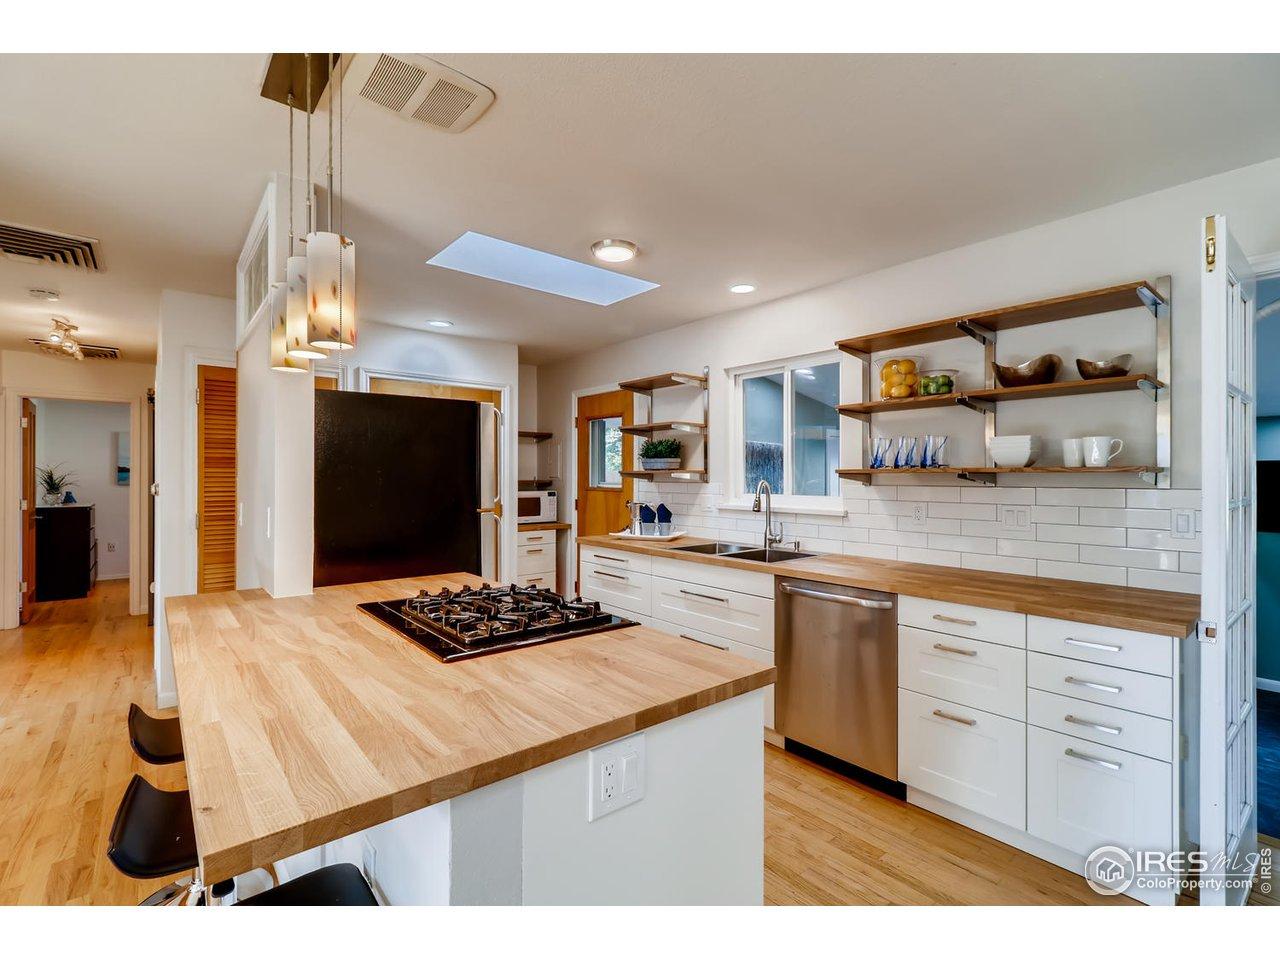 Countertop dining with open kitchen floorplan